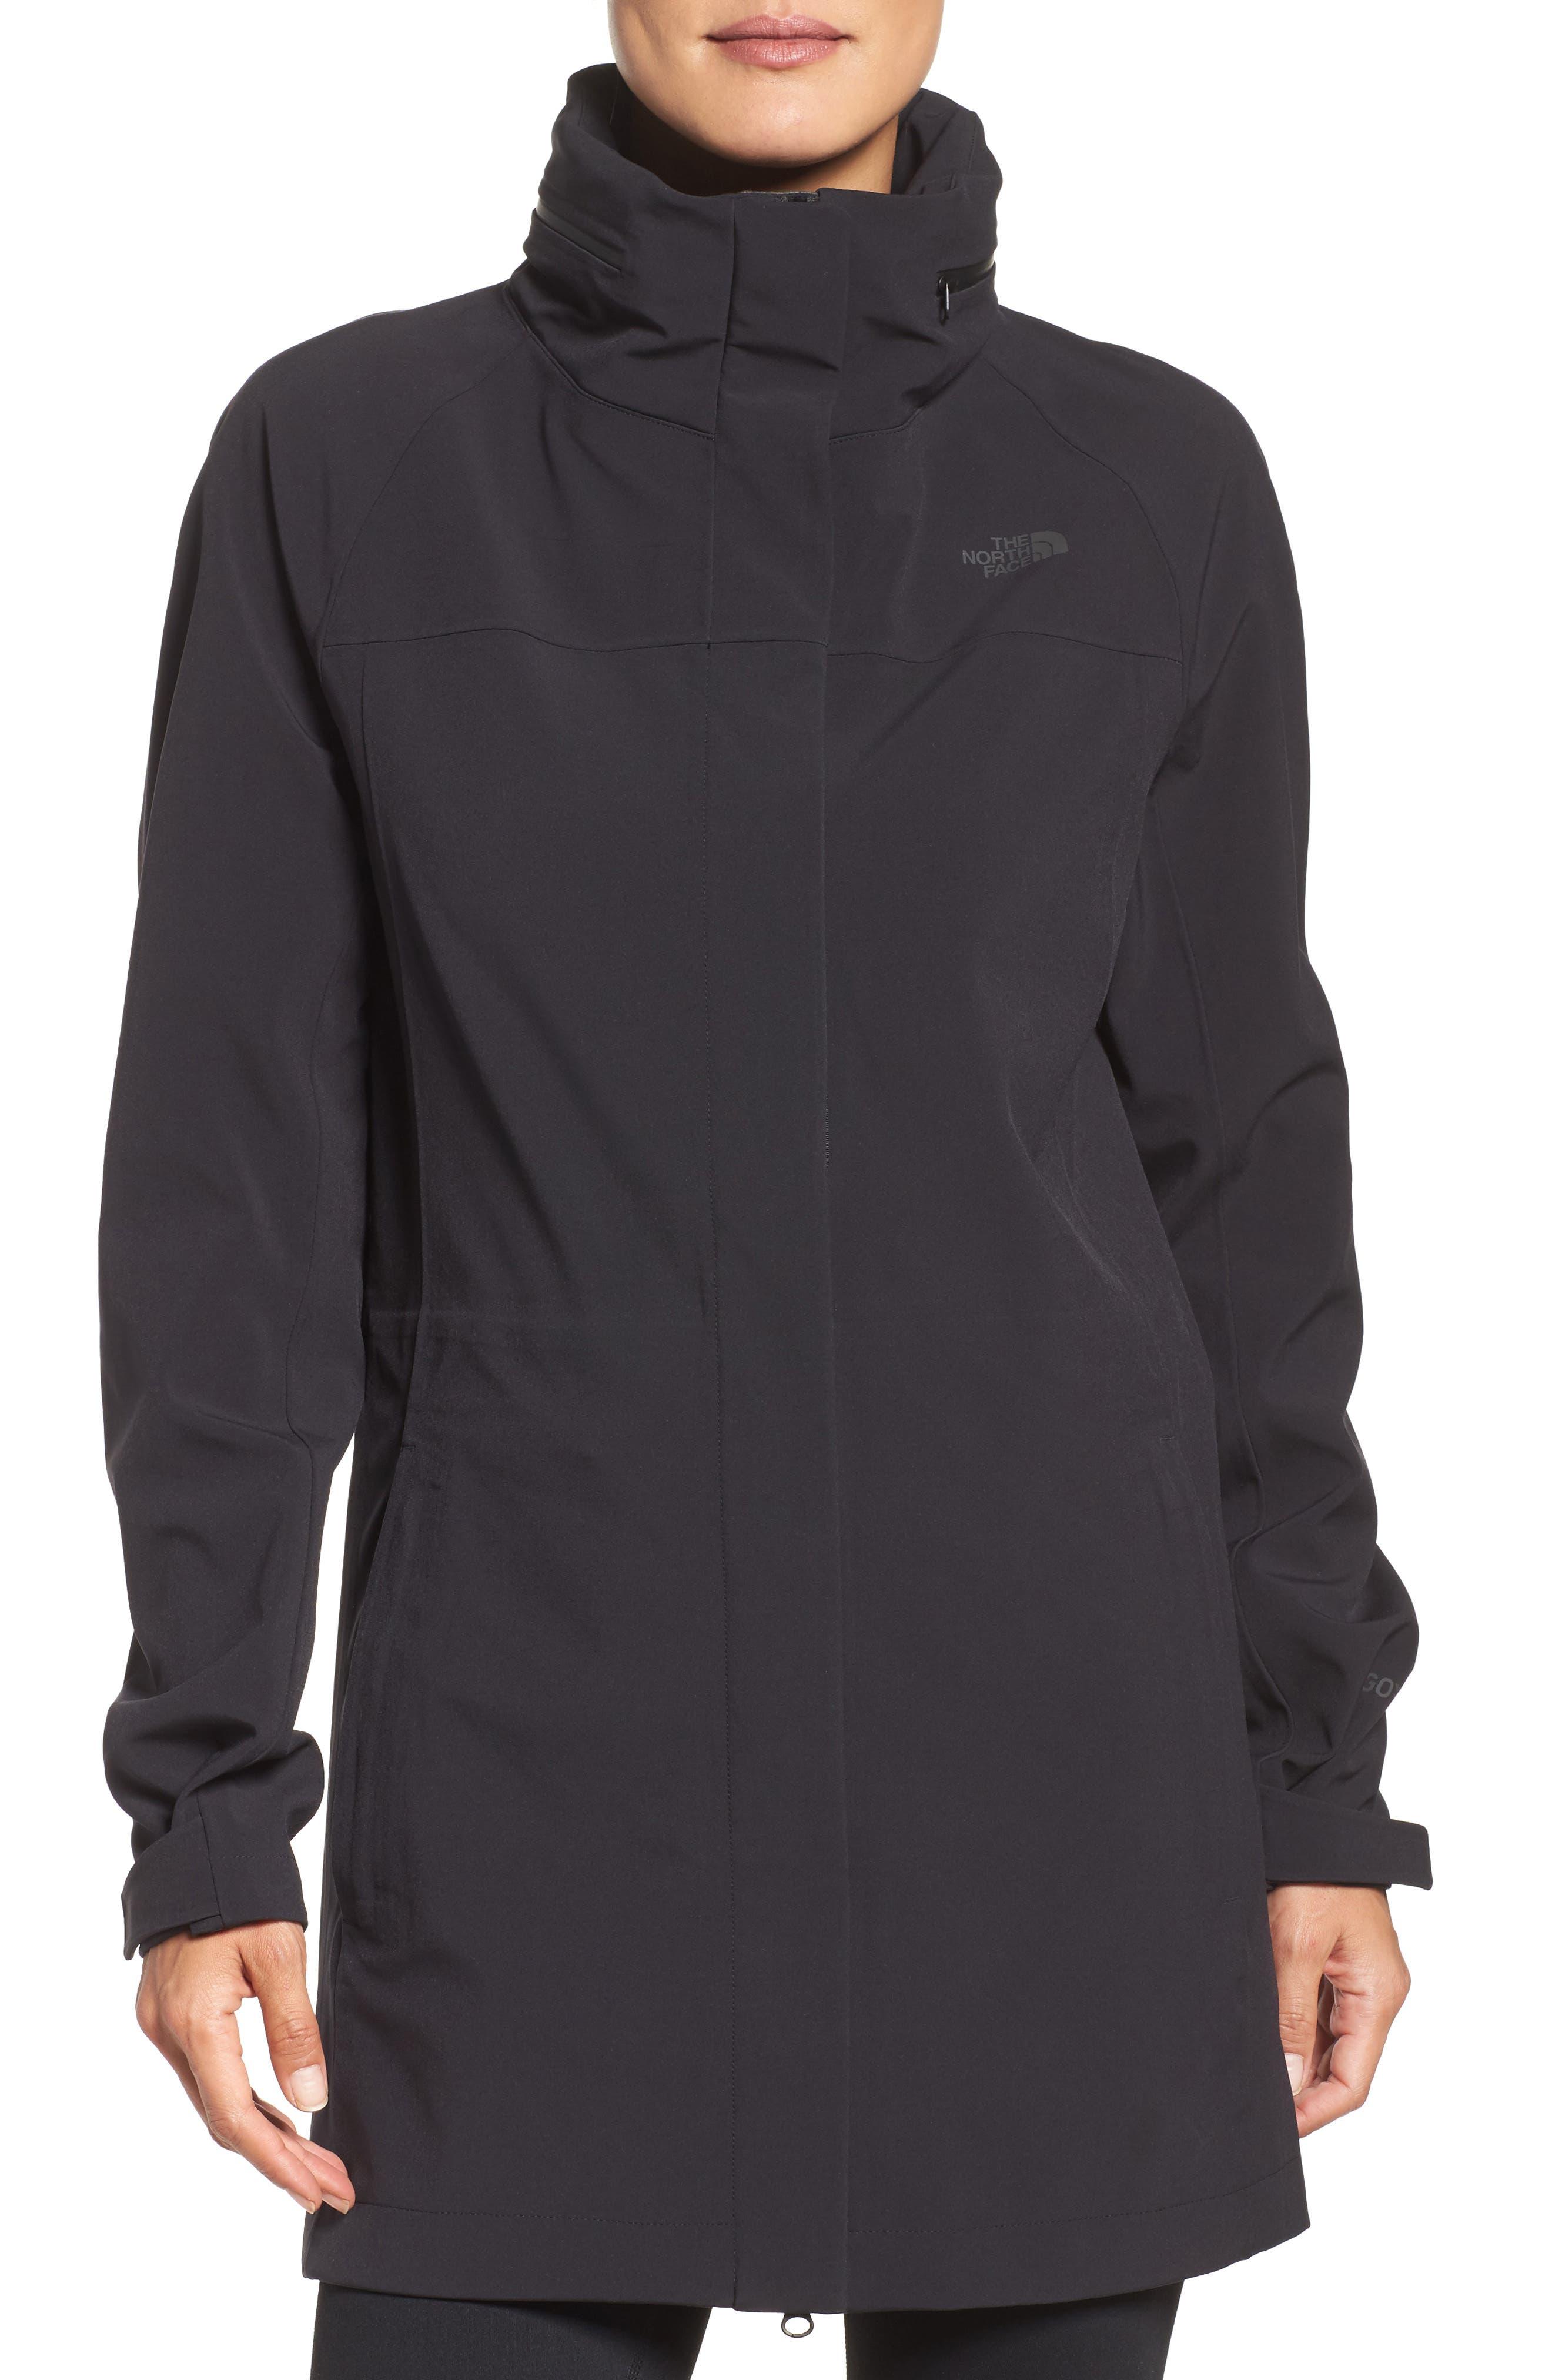 Apex Flex Gore-Tex<sup>®</sup> Disruptor Jacket,                             Main thumbnail 1, color,                             Tnf Black/ Tnf Dark Grey